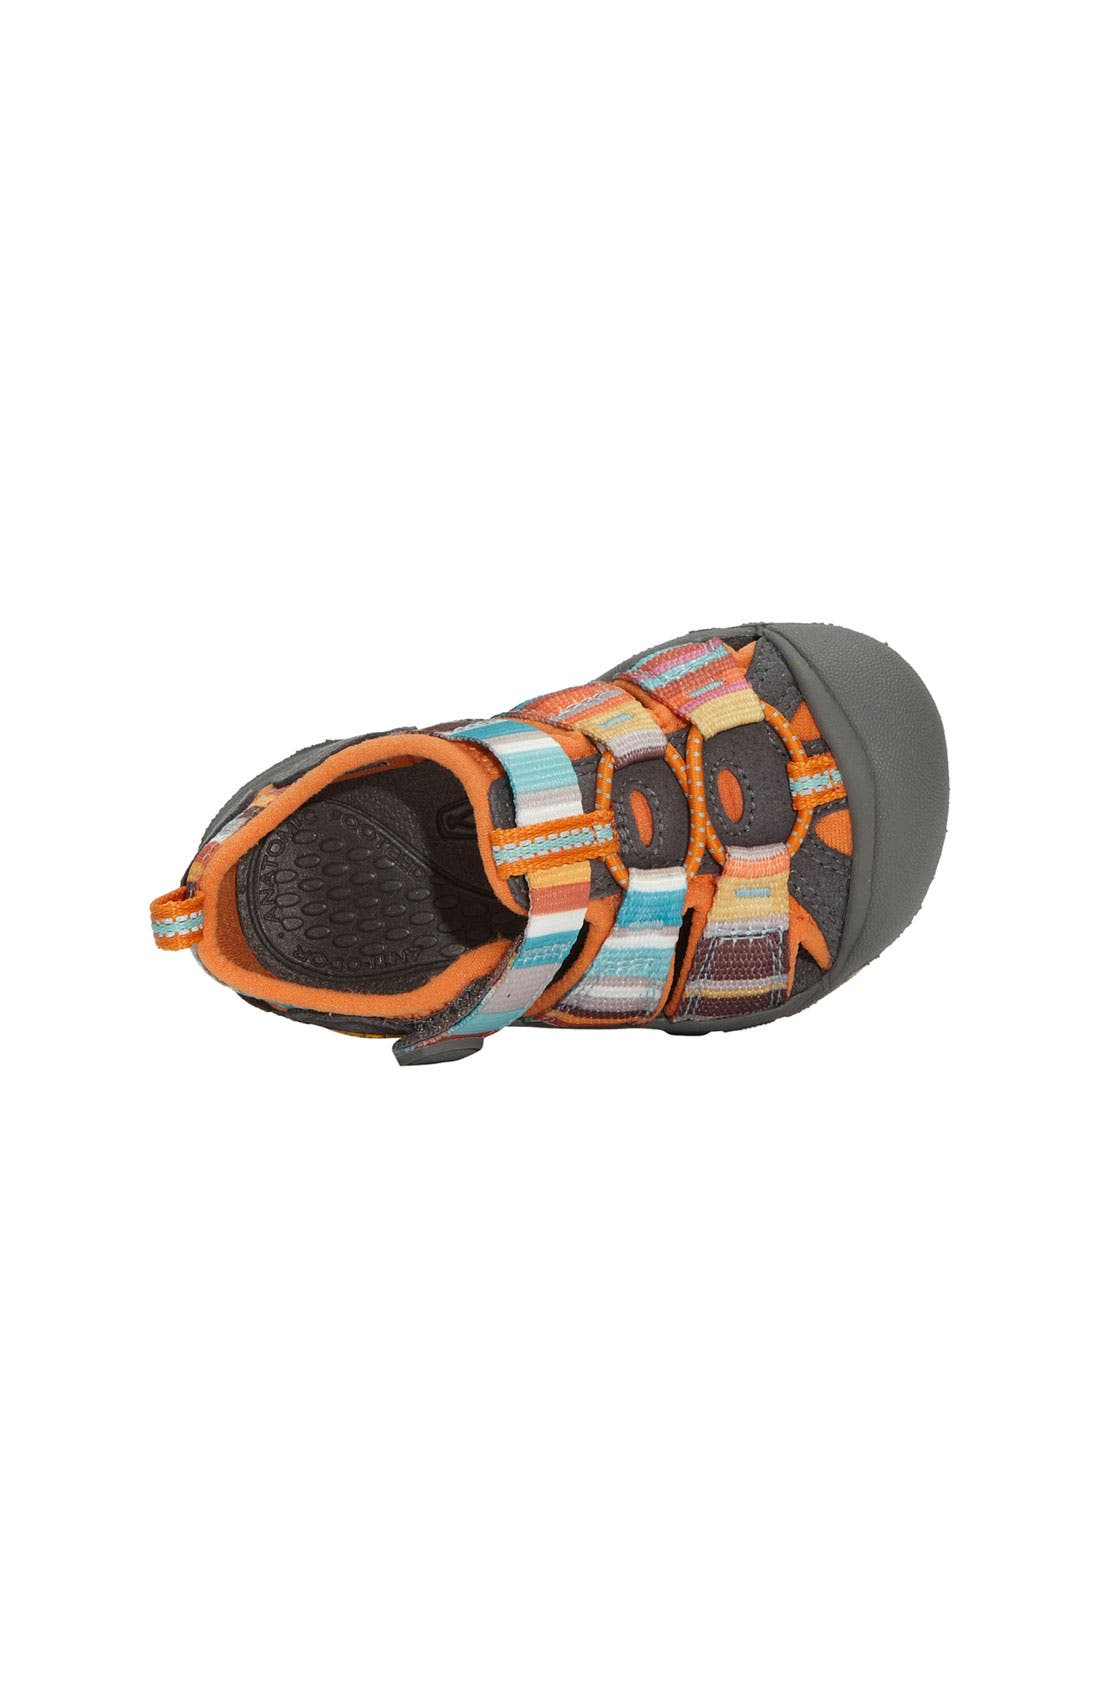 Alternate Image 2  - Keen 'Newport H2' Sandal (Baby & Walker)